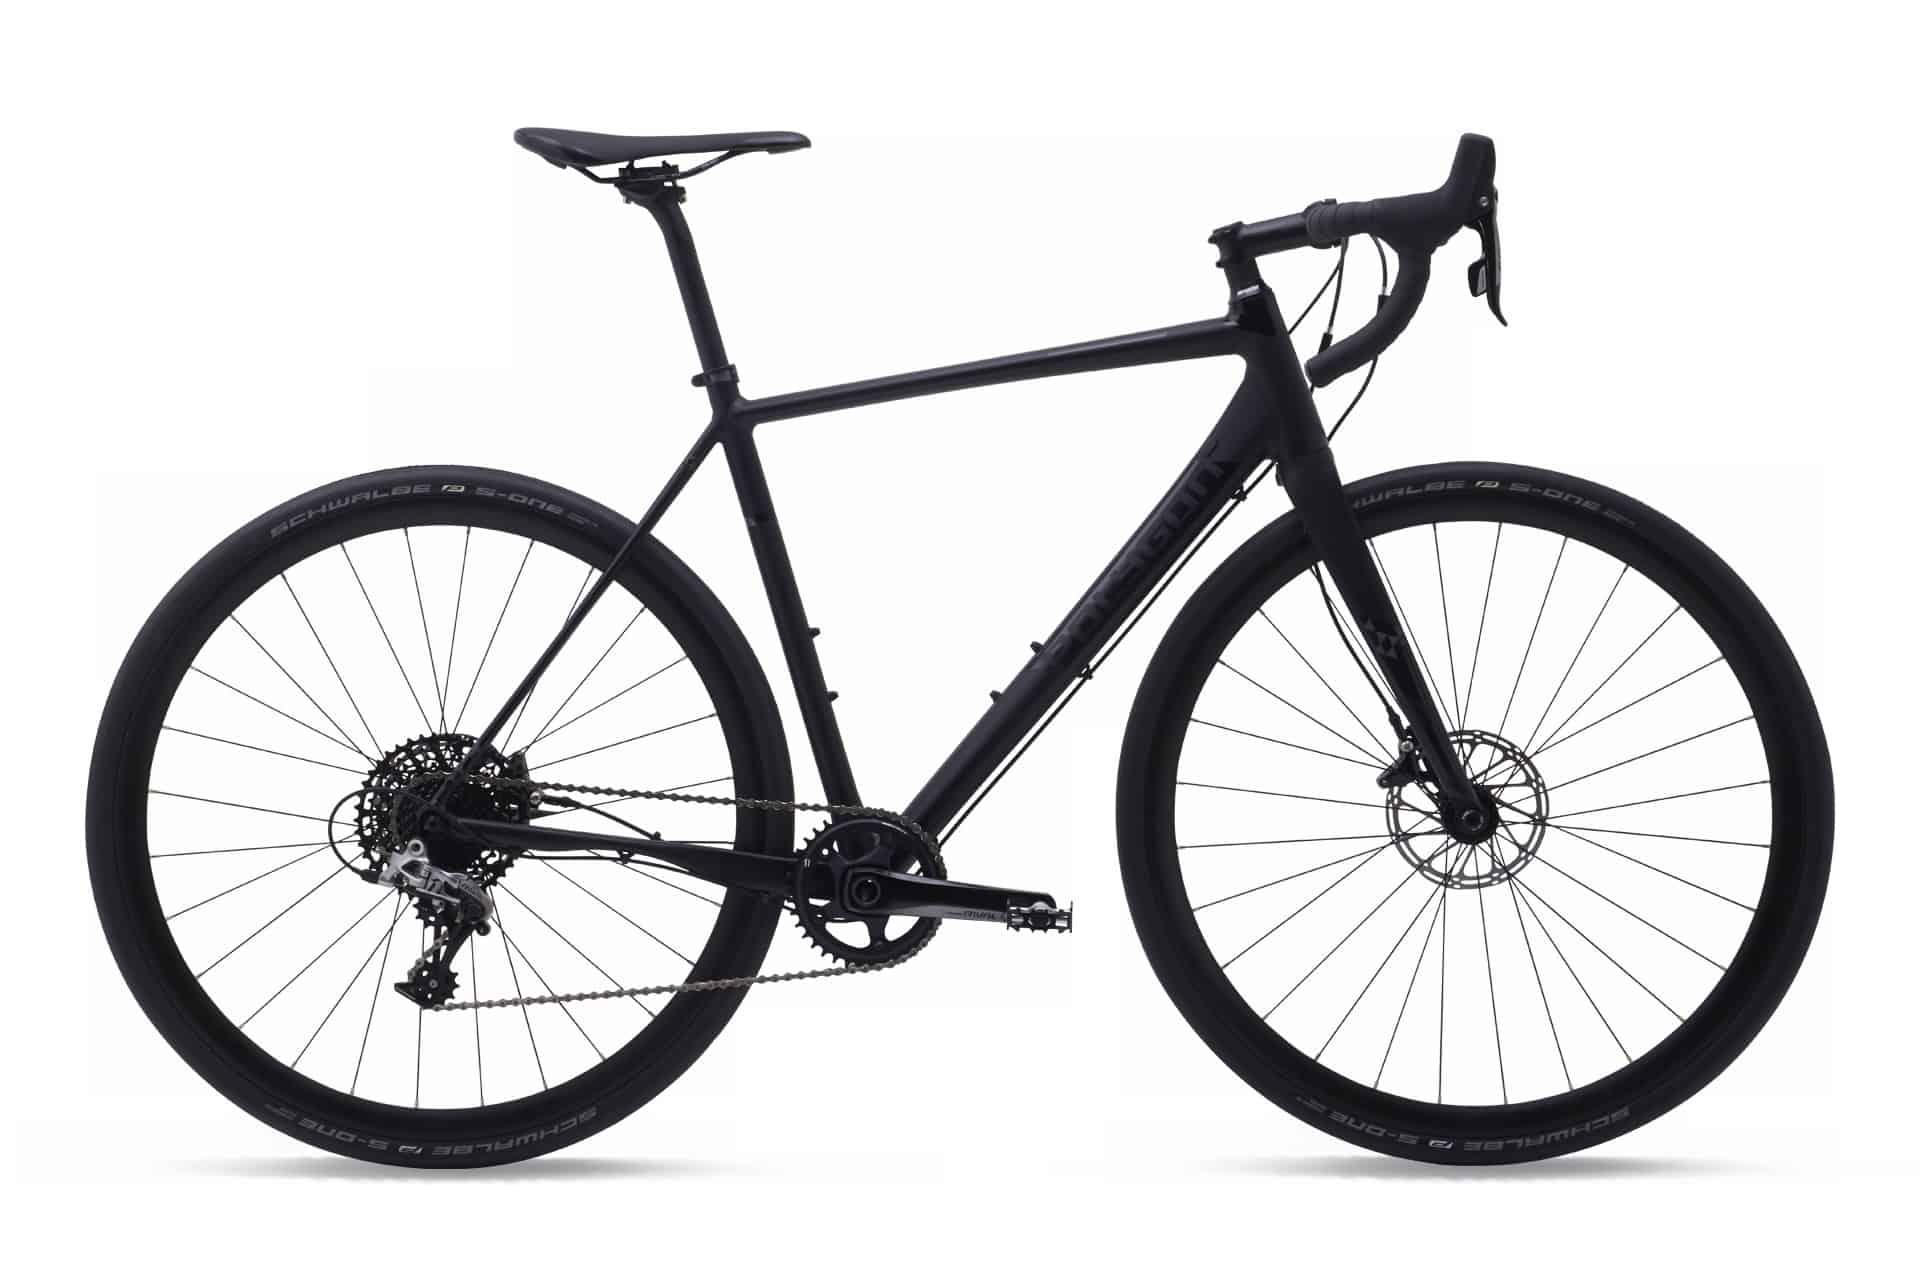 Sepeda jenis SRAM RIVAL 11-SPEED - Sepeda.Me